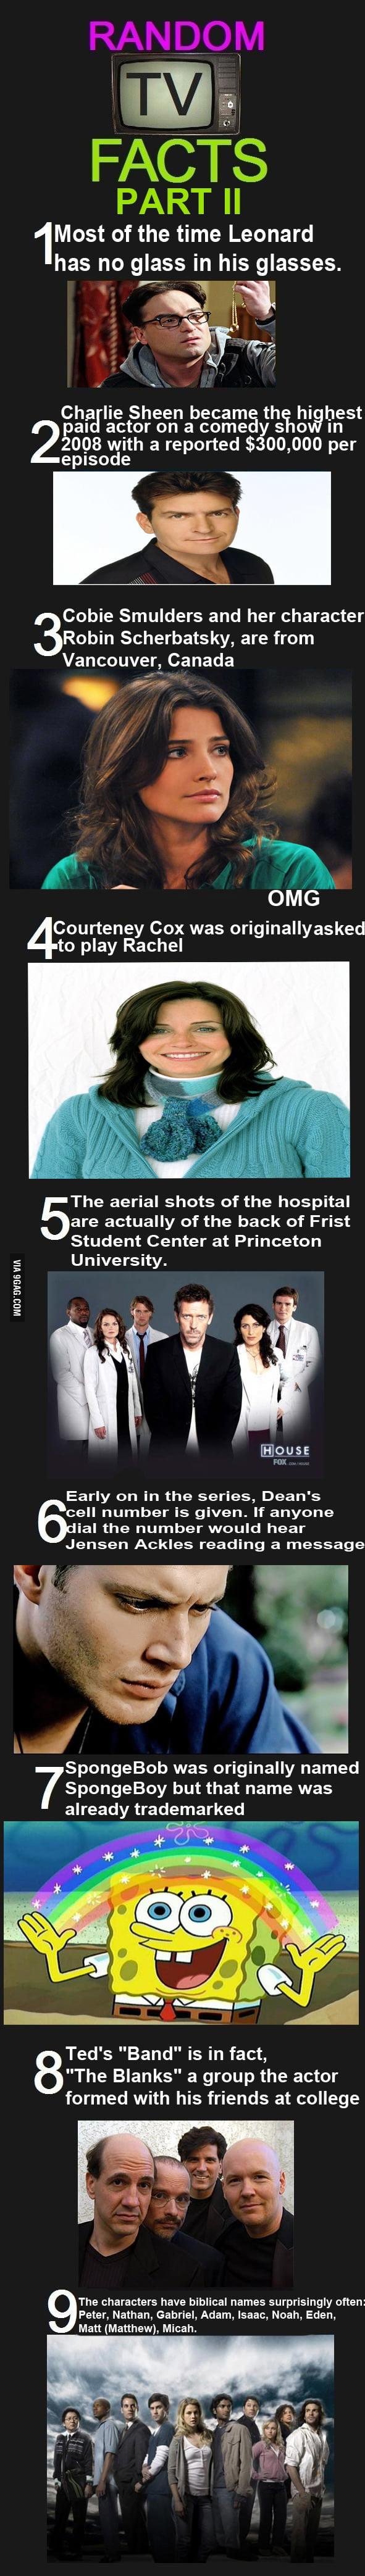 Random TV Facts (Part II)